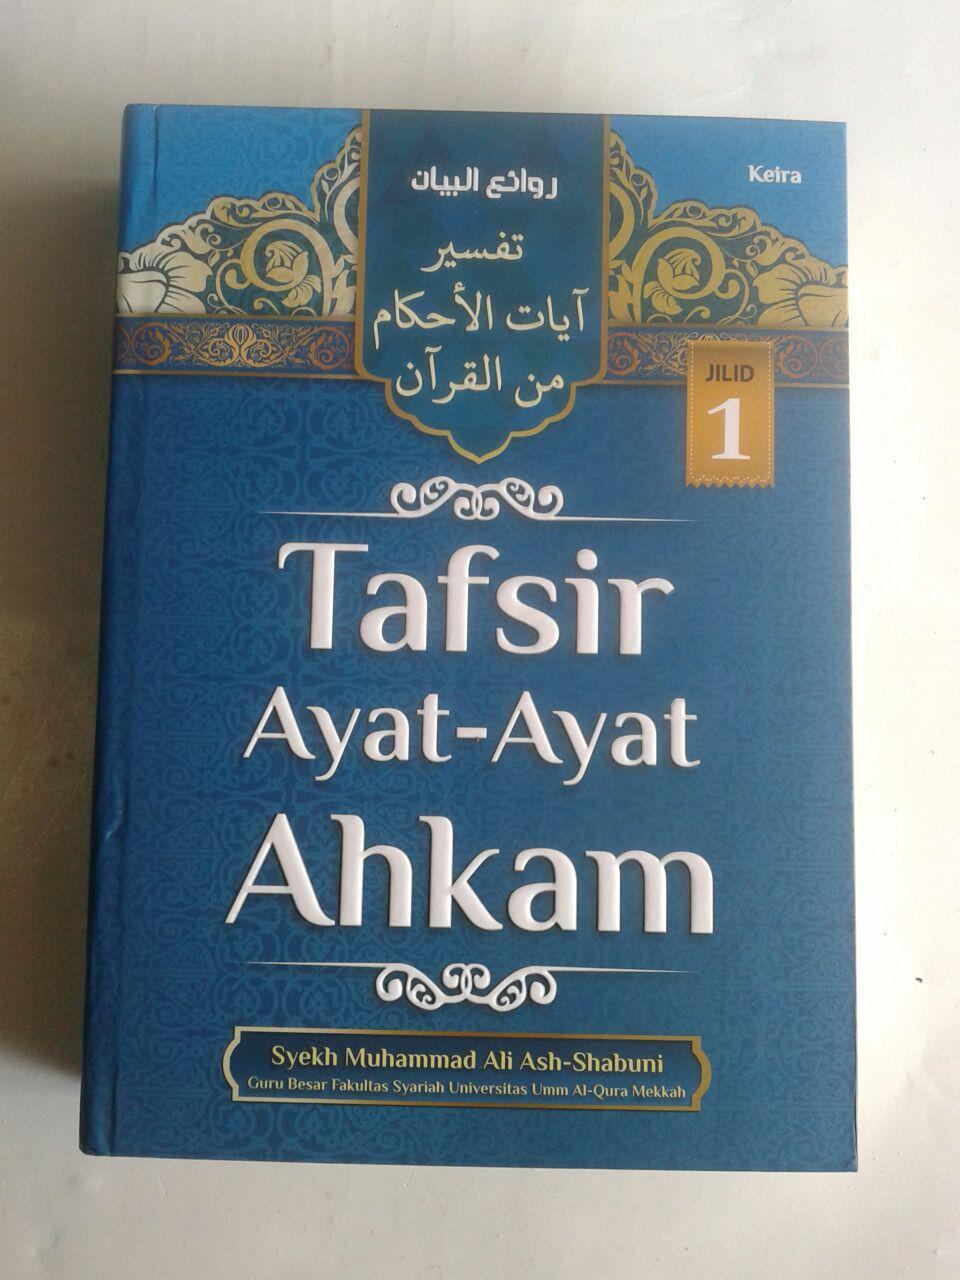 Buku Tafsir Ayat-Ayat Ahkam Jilid 1 cover 2